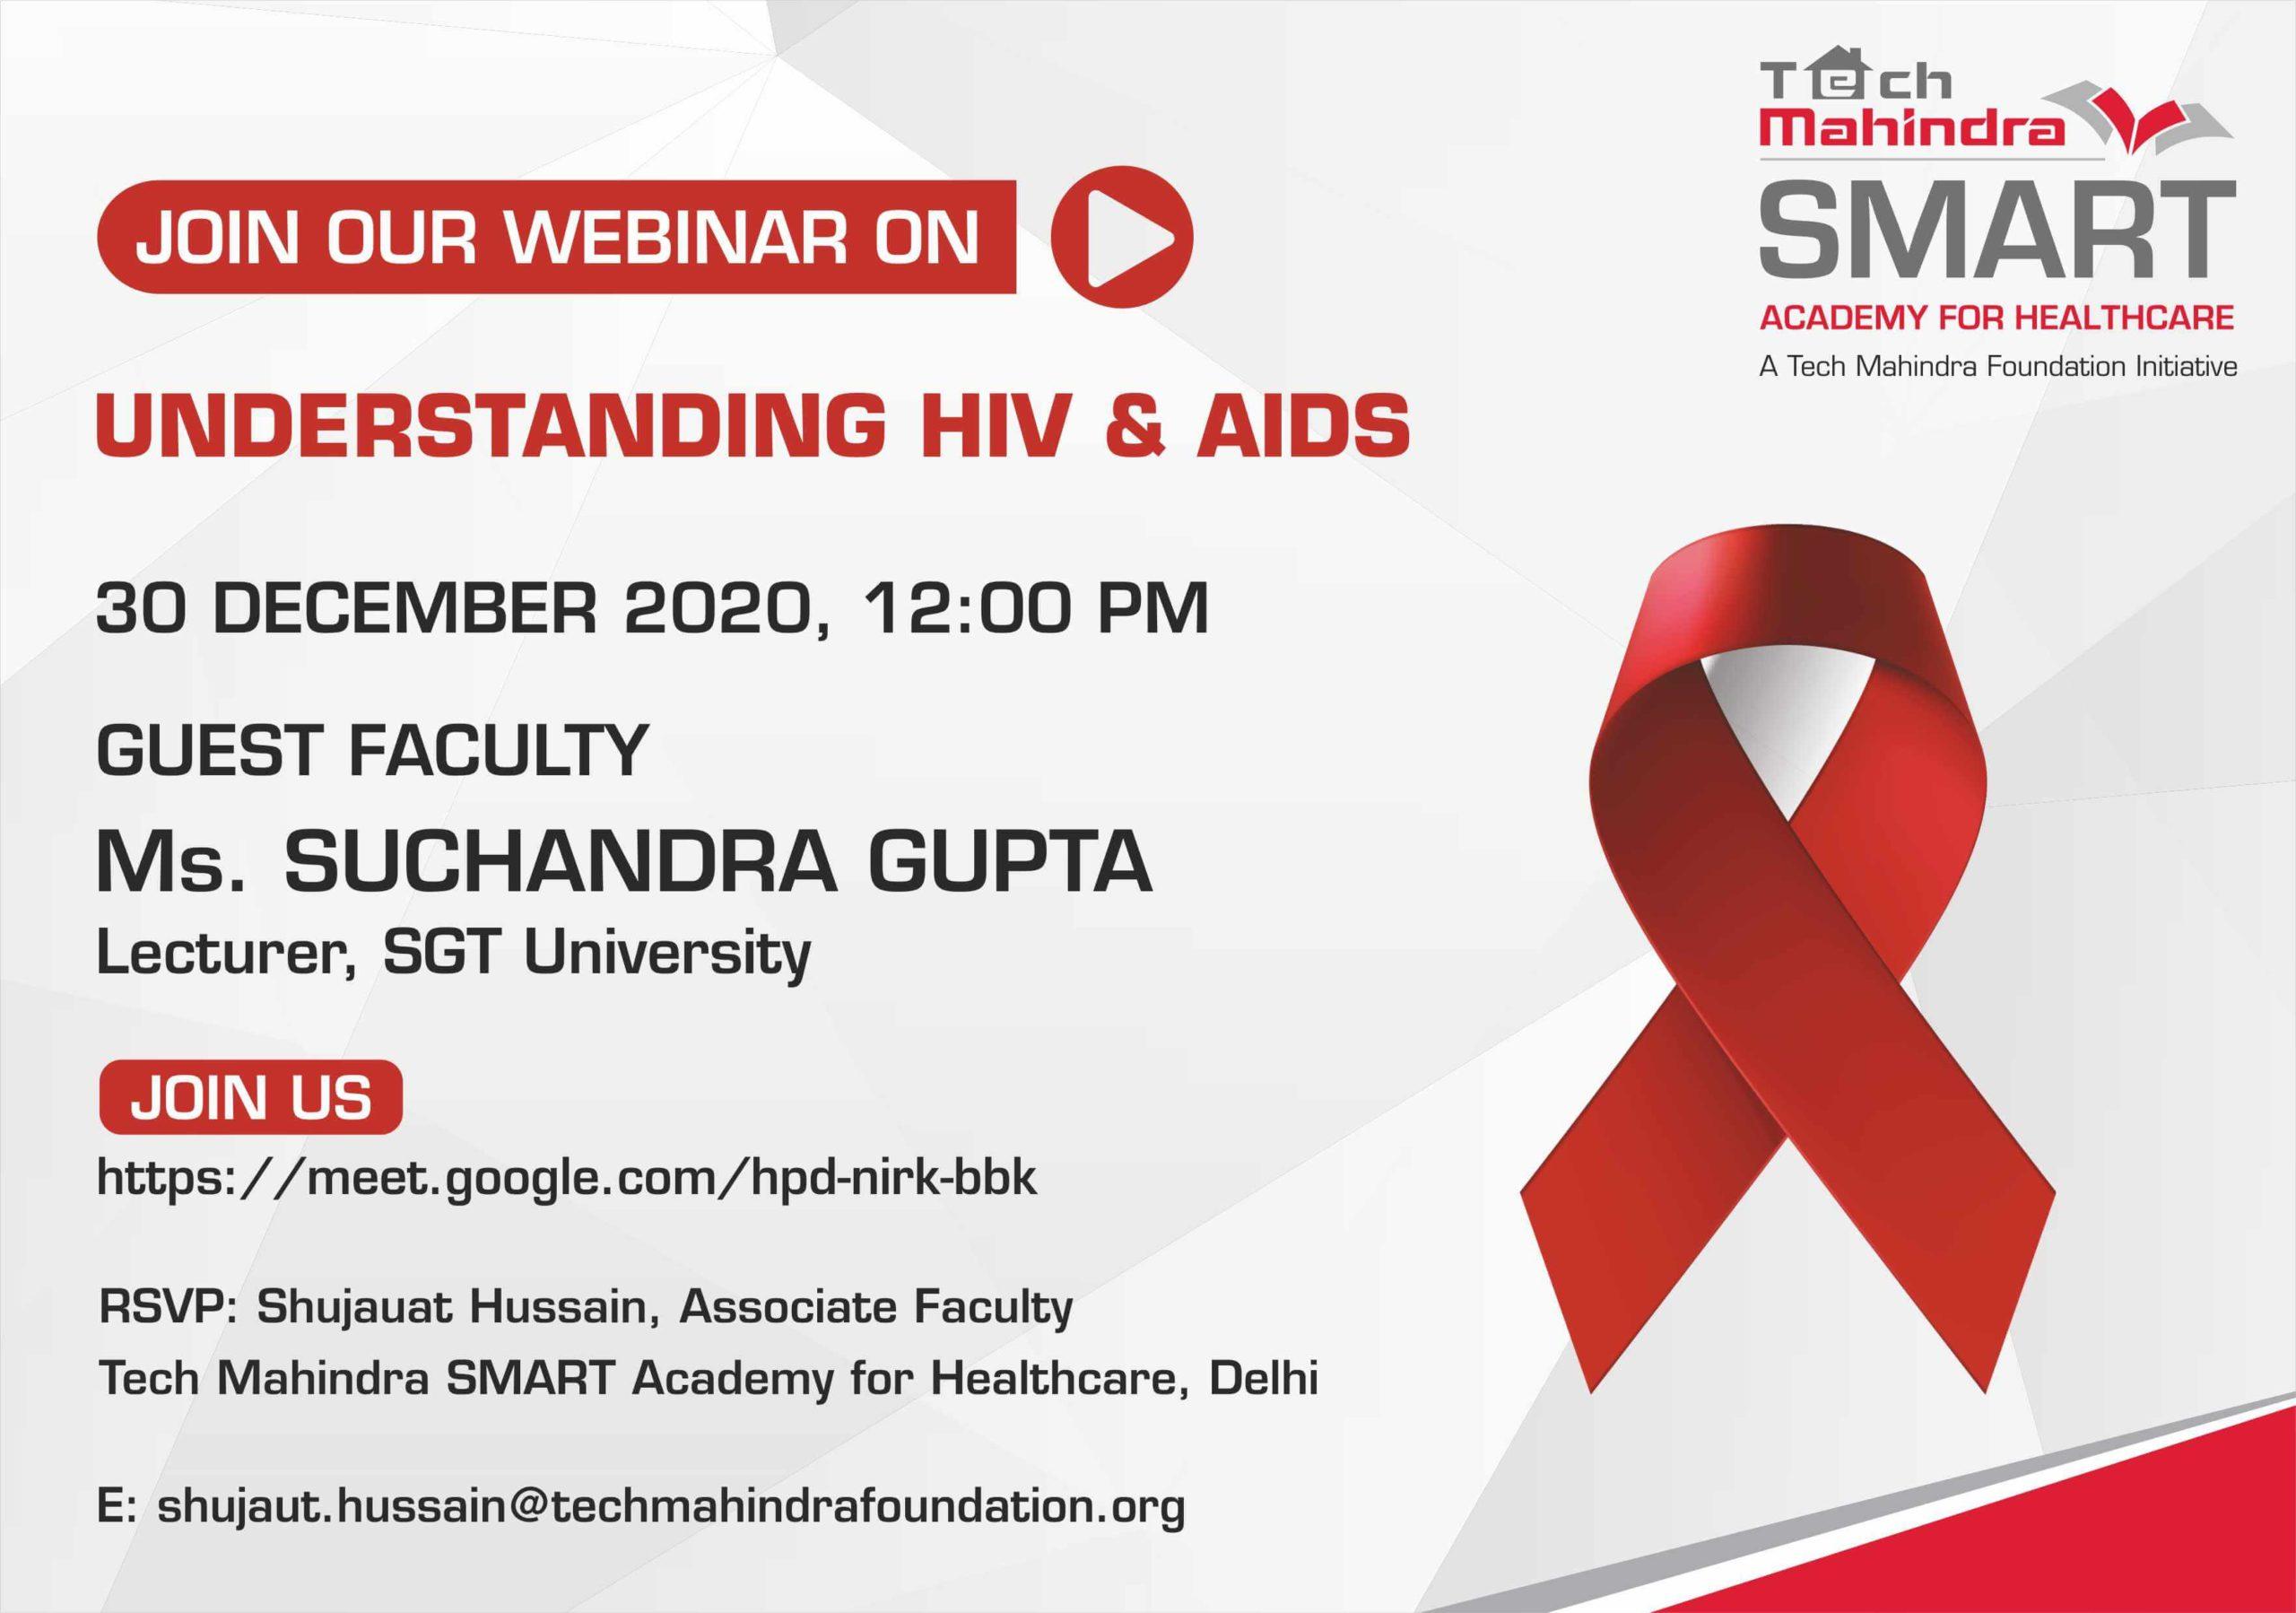 UNDERSTANDING HIV & AIDS Creative